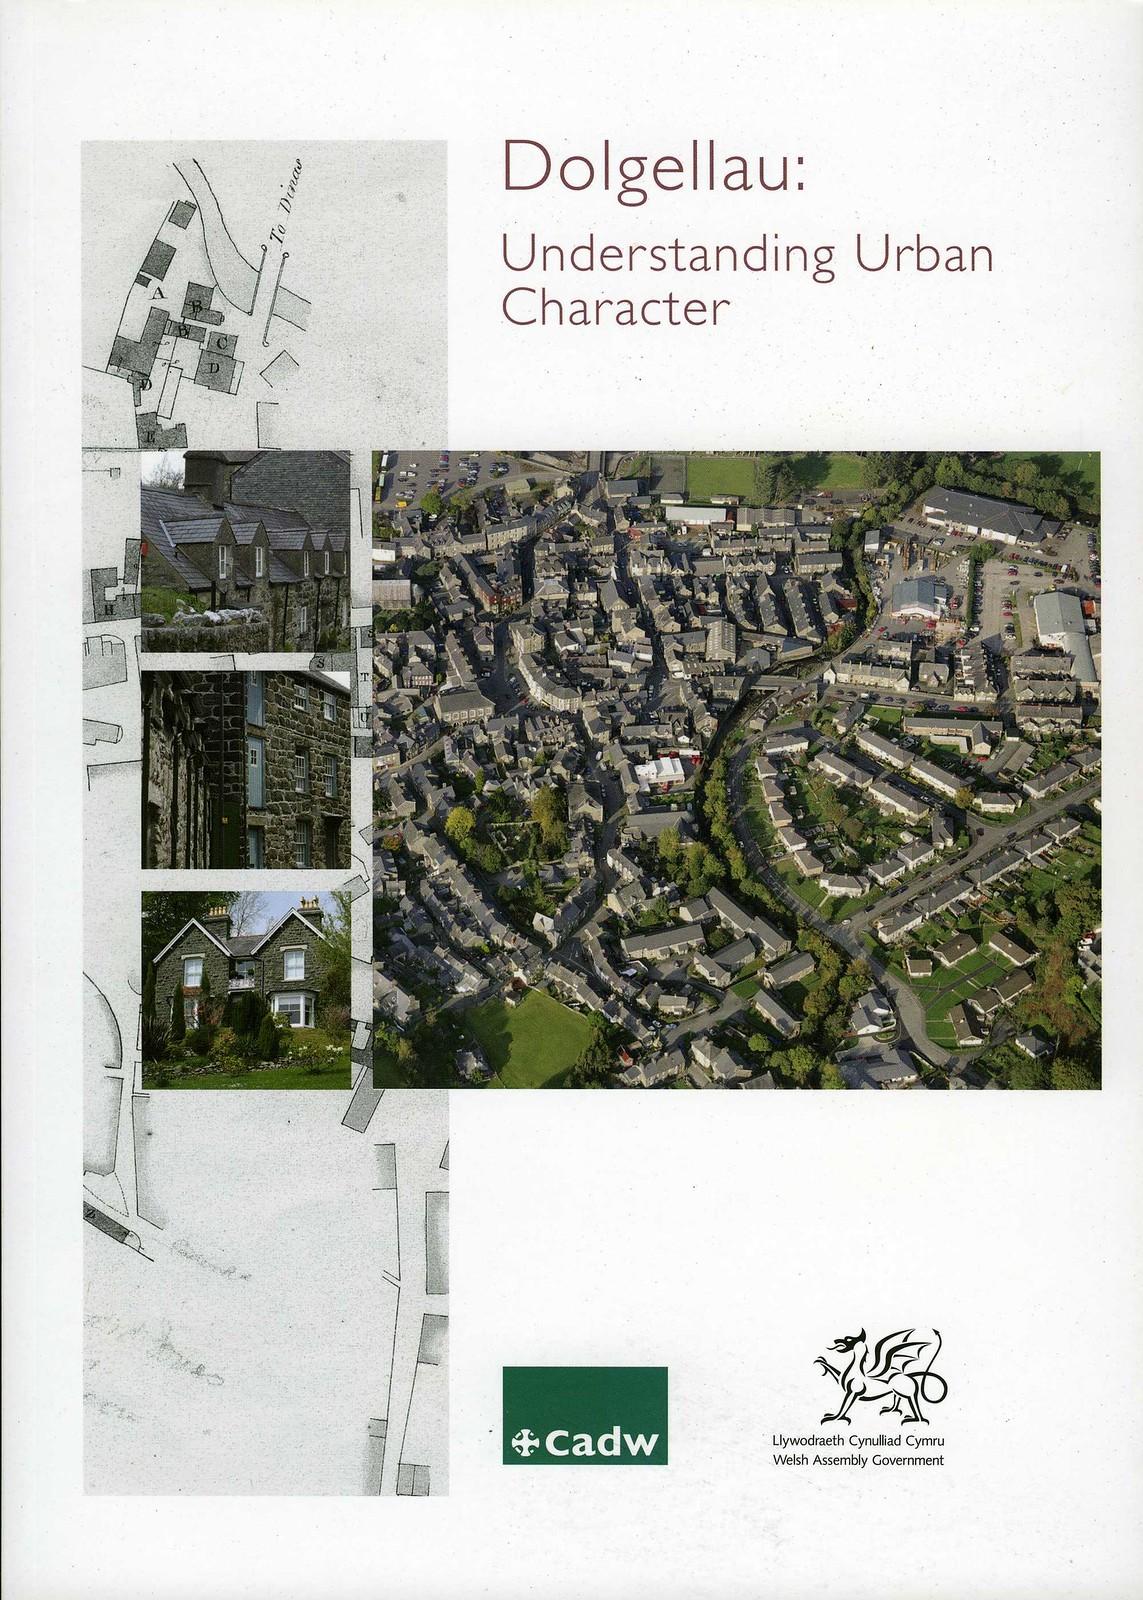 Dolgellau: Understanding Urban Character (English Cover Side) 2009